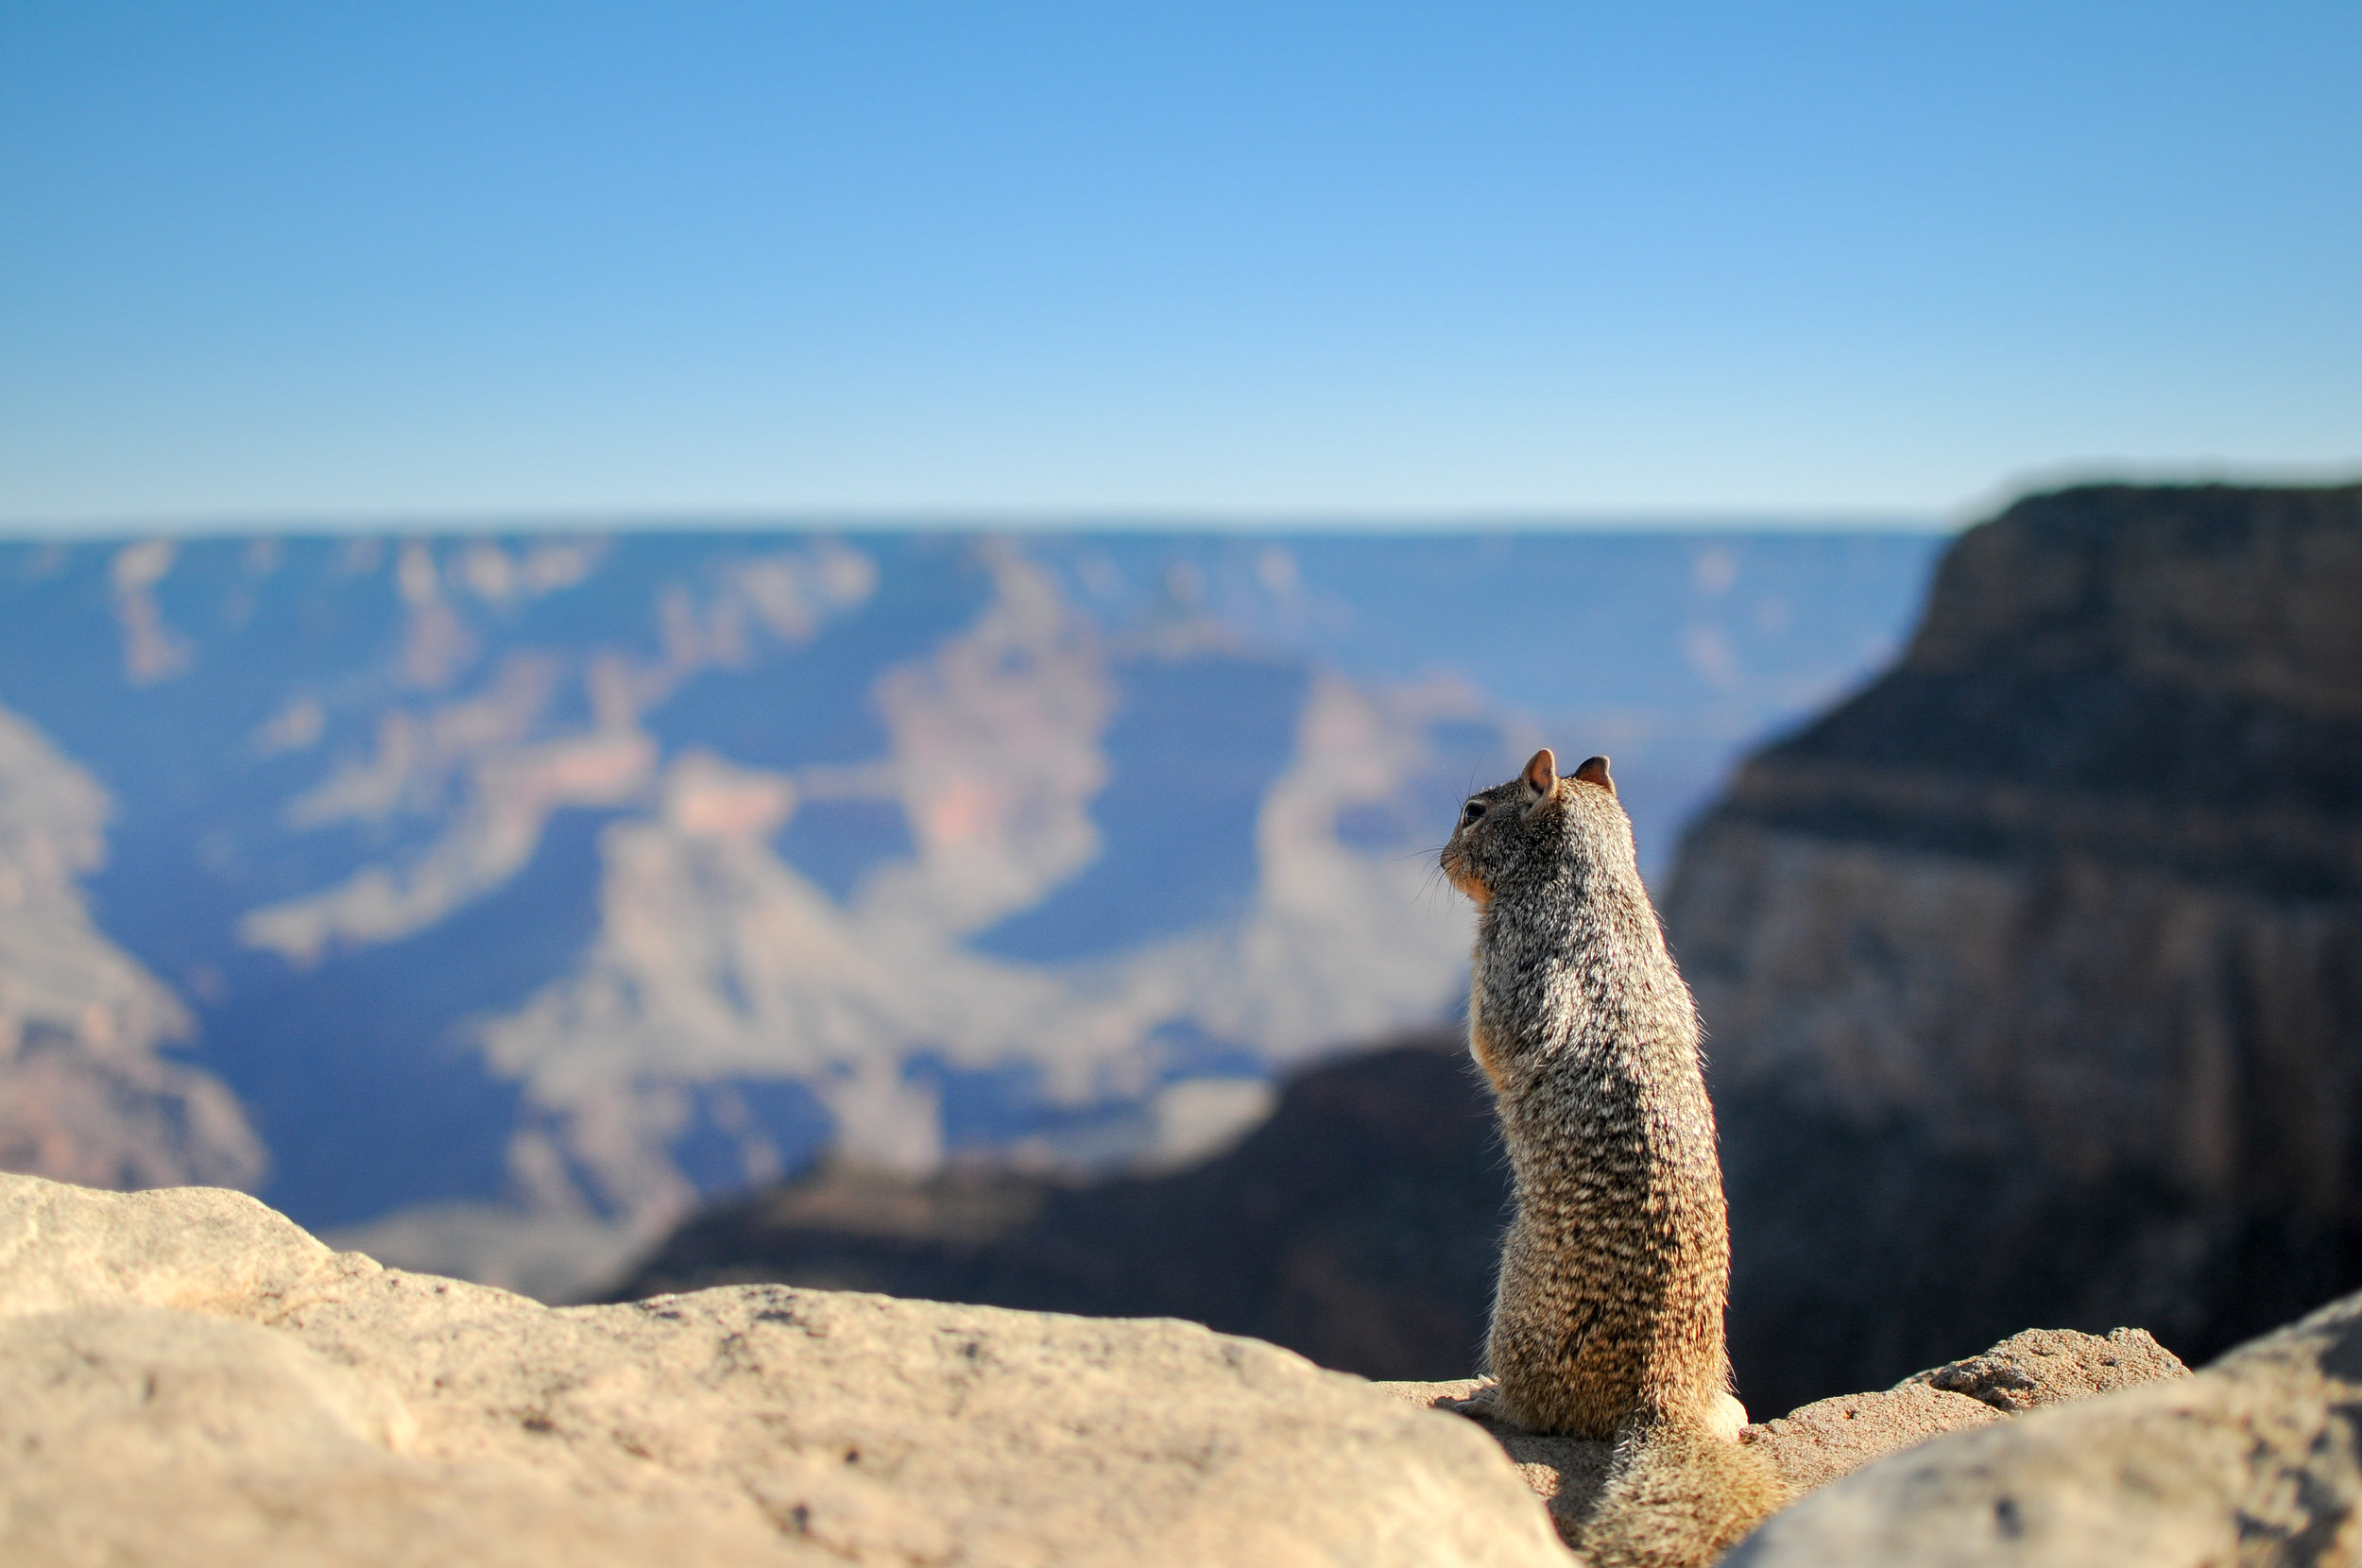 Squirrel! Where?